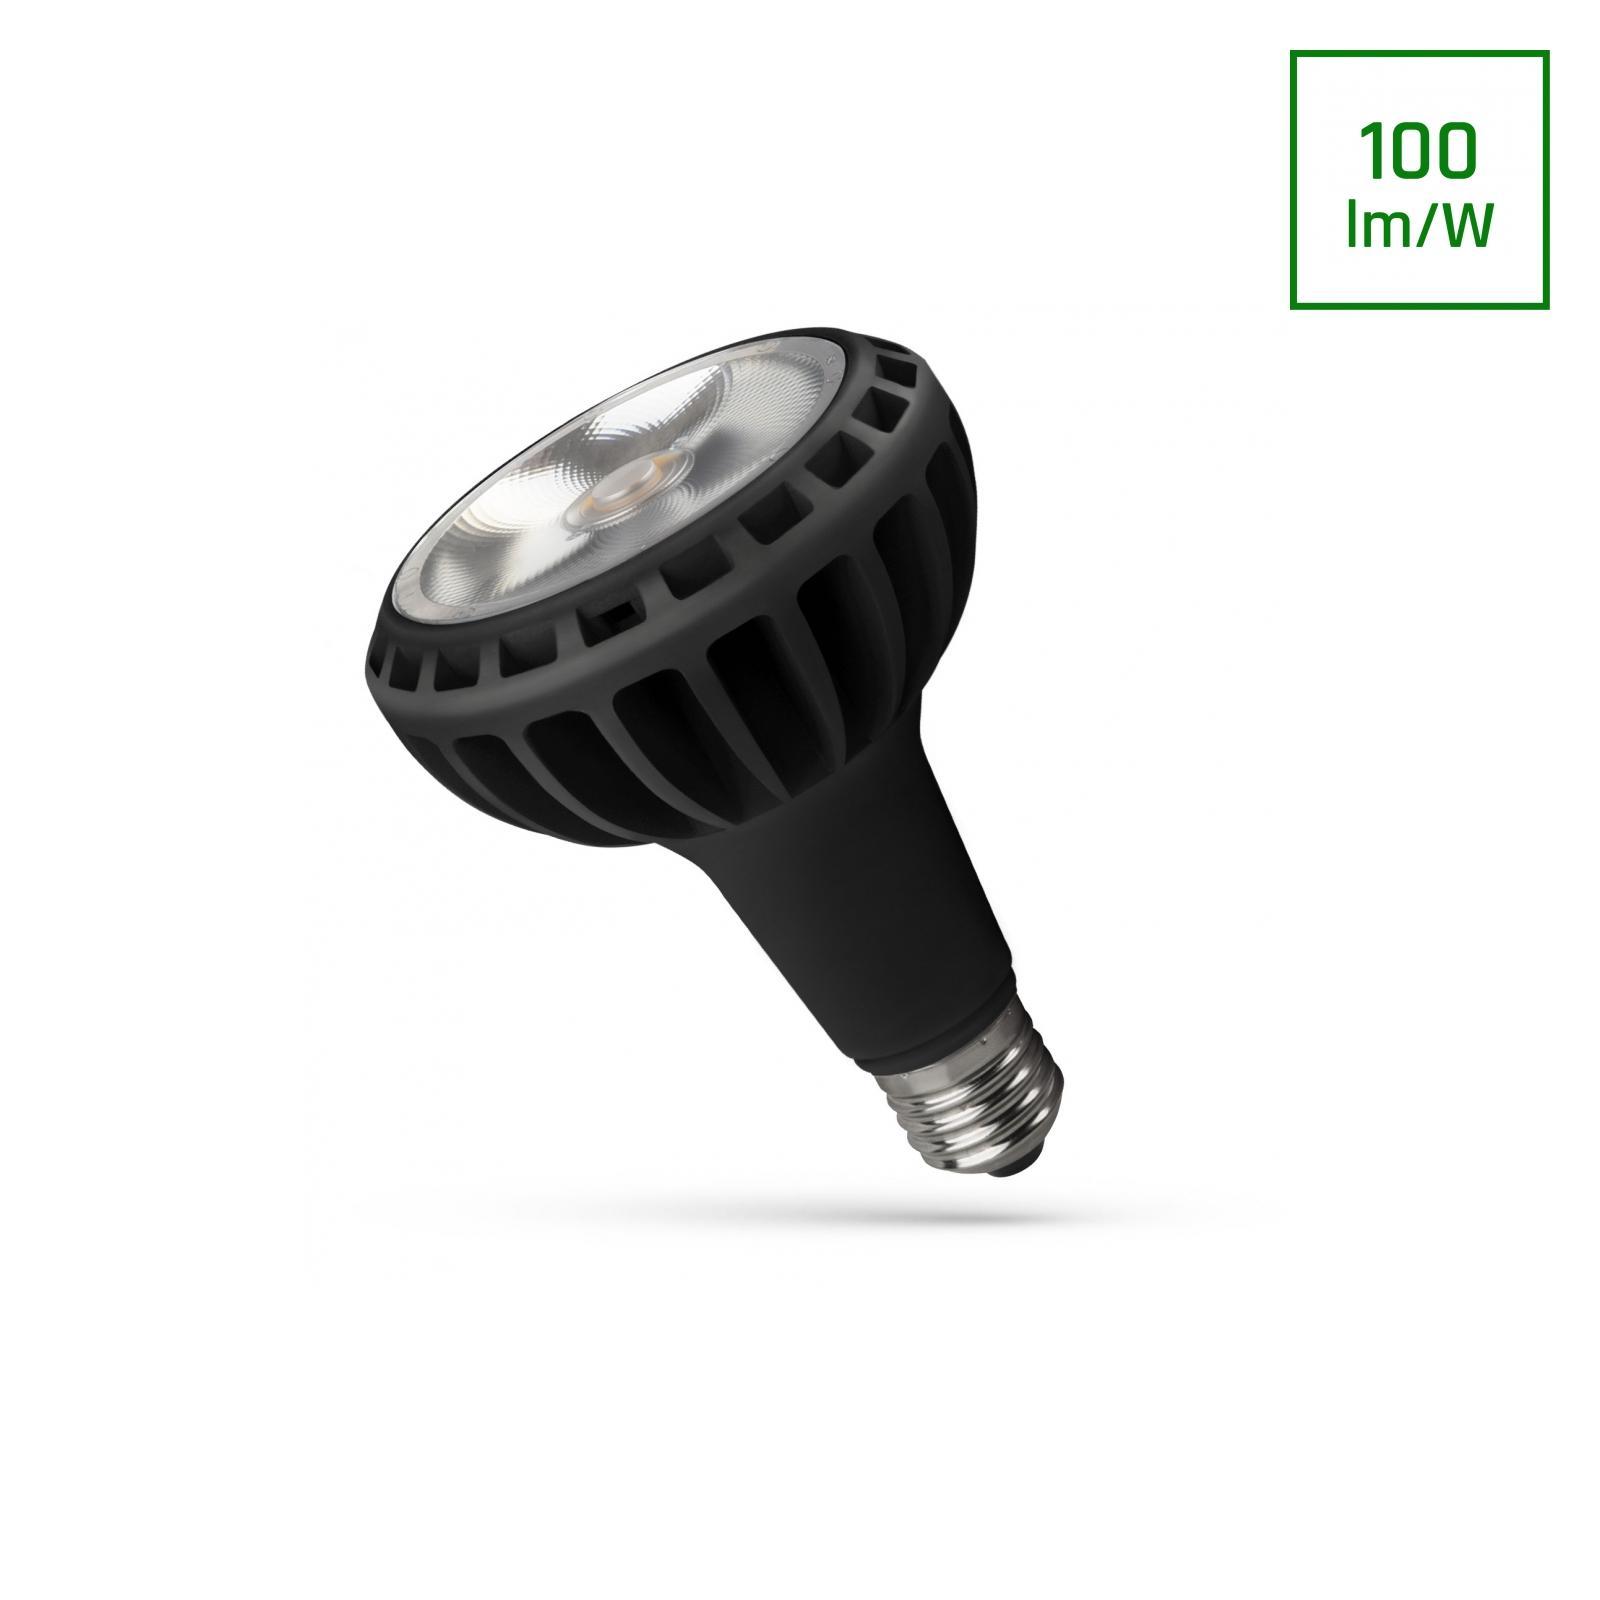 LED PAR30 E27 230V 20W COB 24ST Teplá bílá Černá SPECTRUM